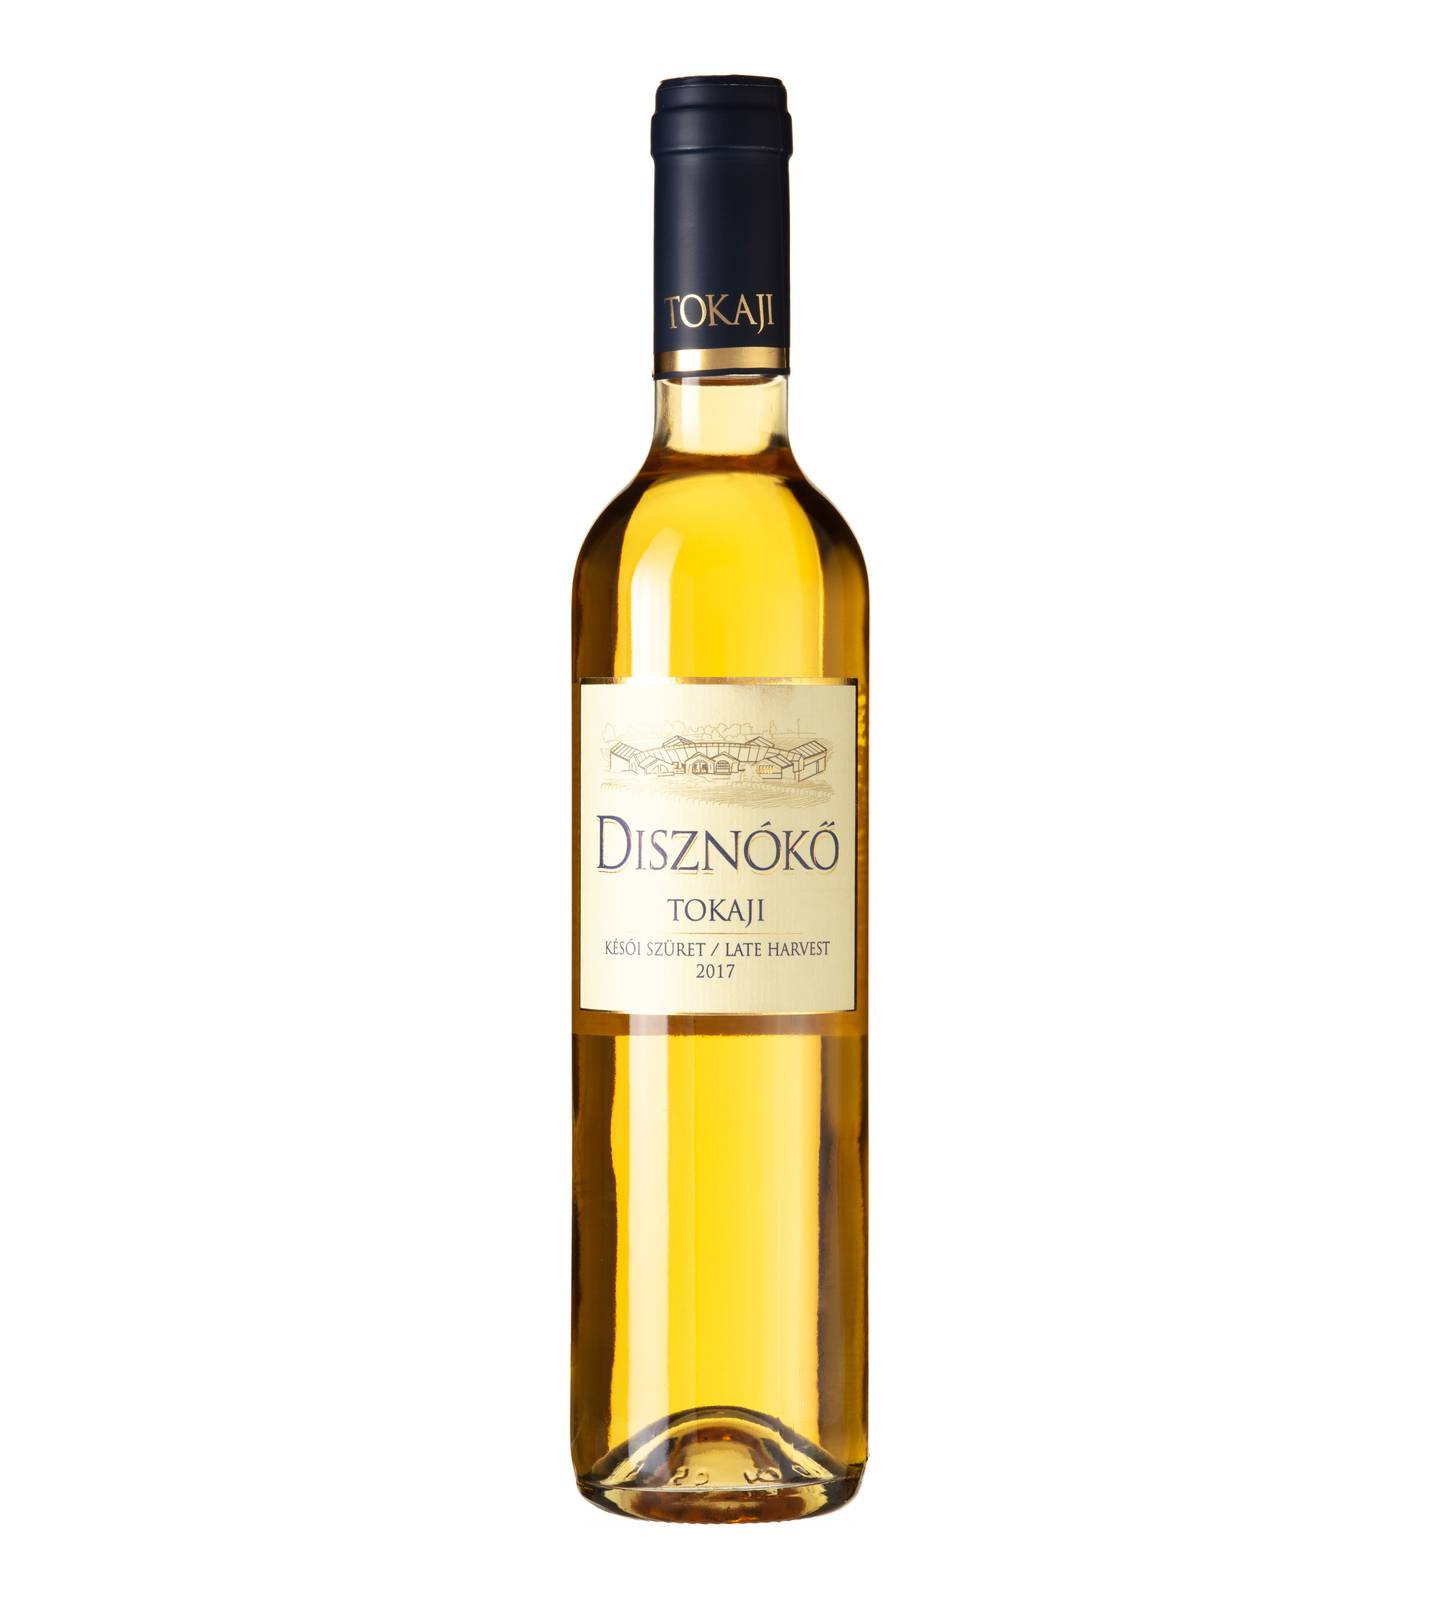 Vinen Disznókö Tokaji Furmint Late Harvest 2017, til kroner 177,90.